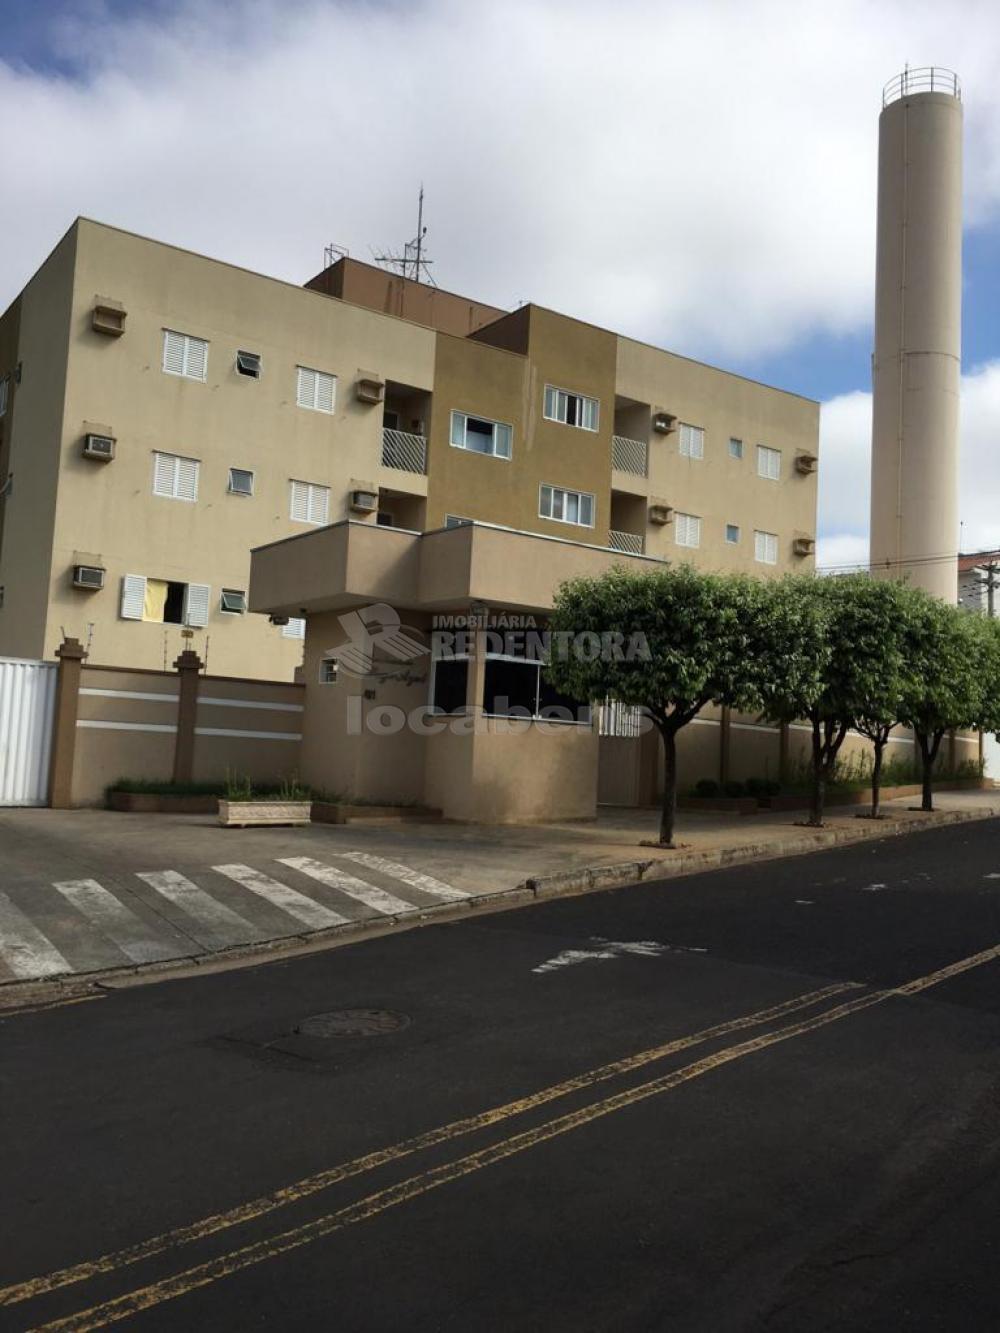 Sao Jose do Rio Preto Apartamento Venda R$250.000,00 Condominio R$360,00 3 Dormitorios 2 Vagas Area construida 113.00m2